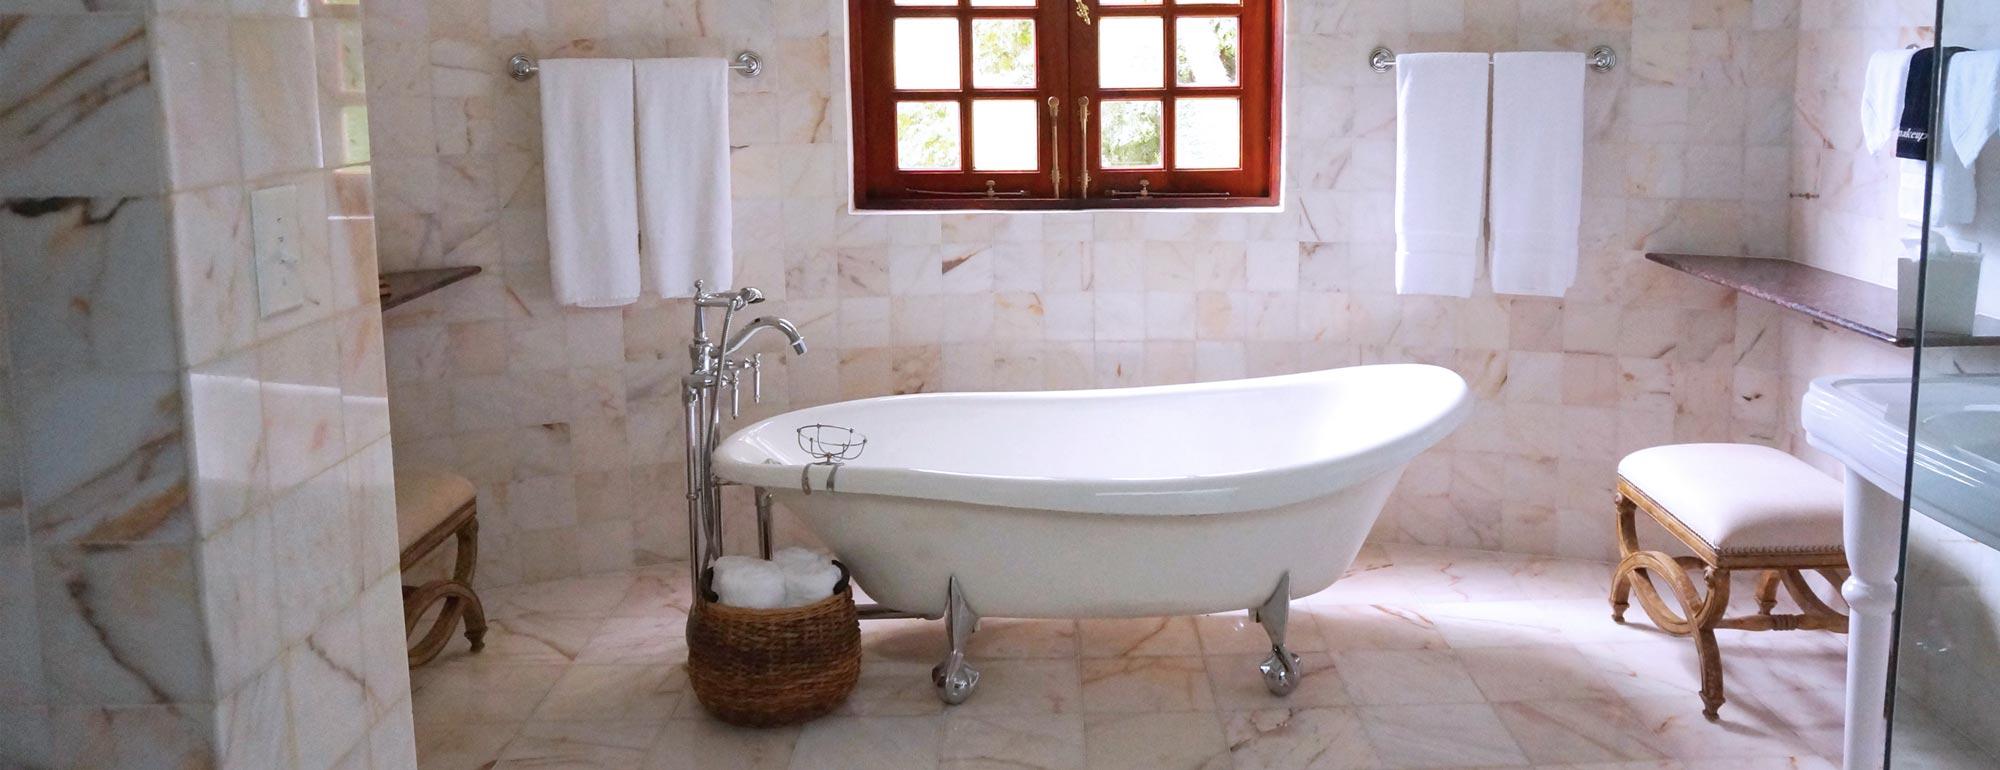 luxury-bathroom-renovations, Kitchen Renovation, Bathroom Renovation, House Renovation Auckland